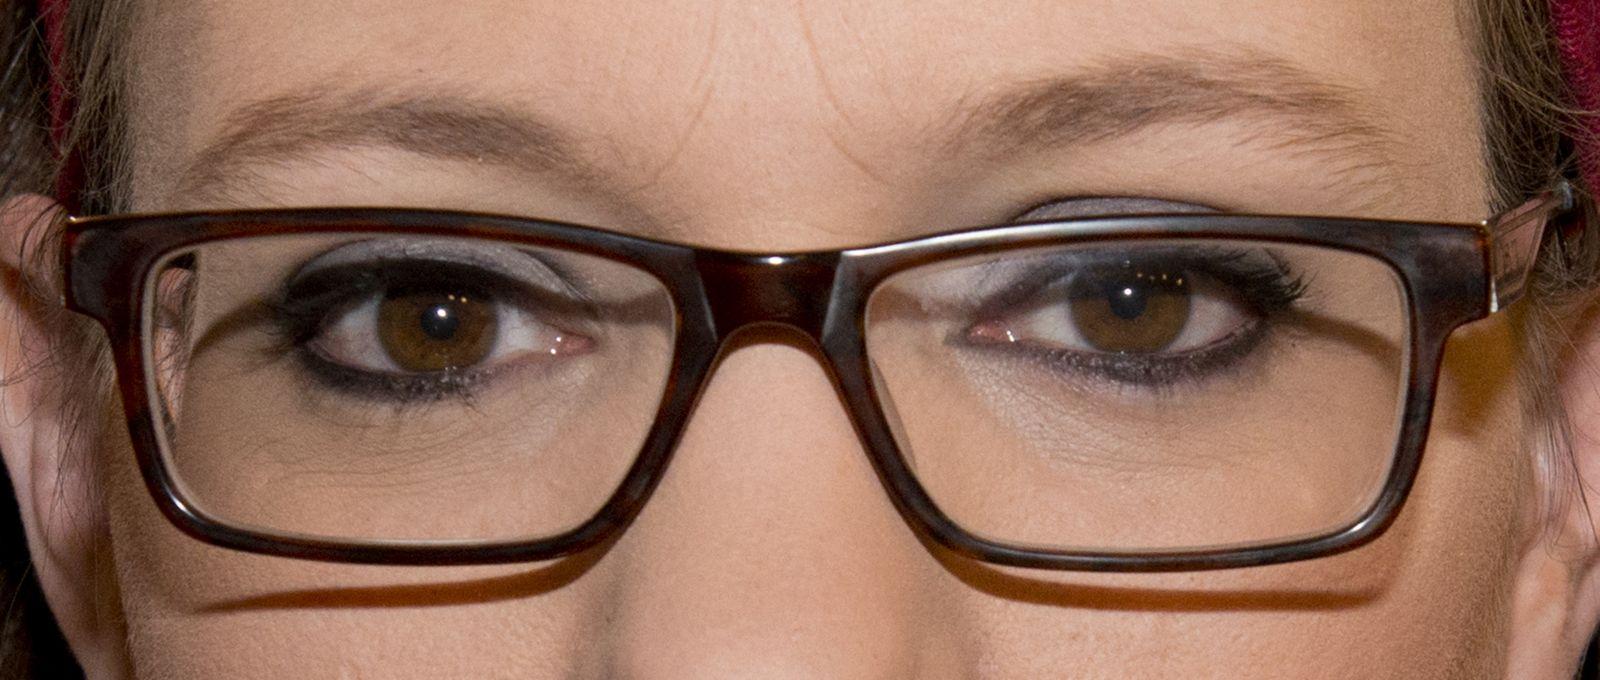 These eyes belong to Israeli news reporter Sivan Rahav-Meir. Photo: courtesy